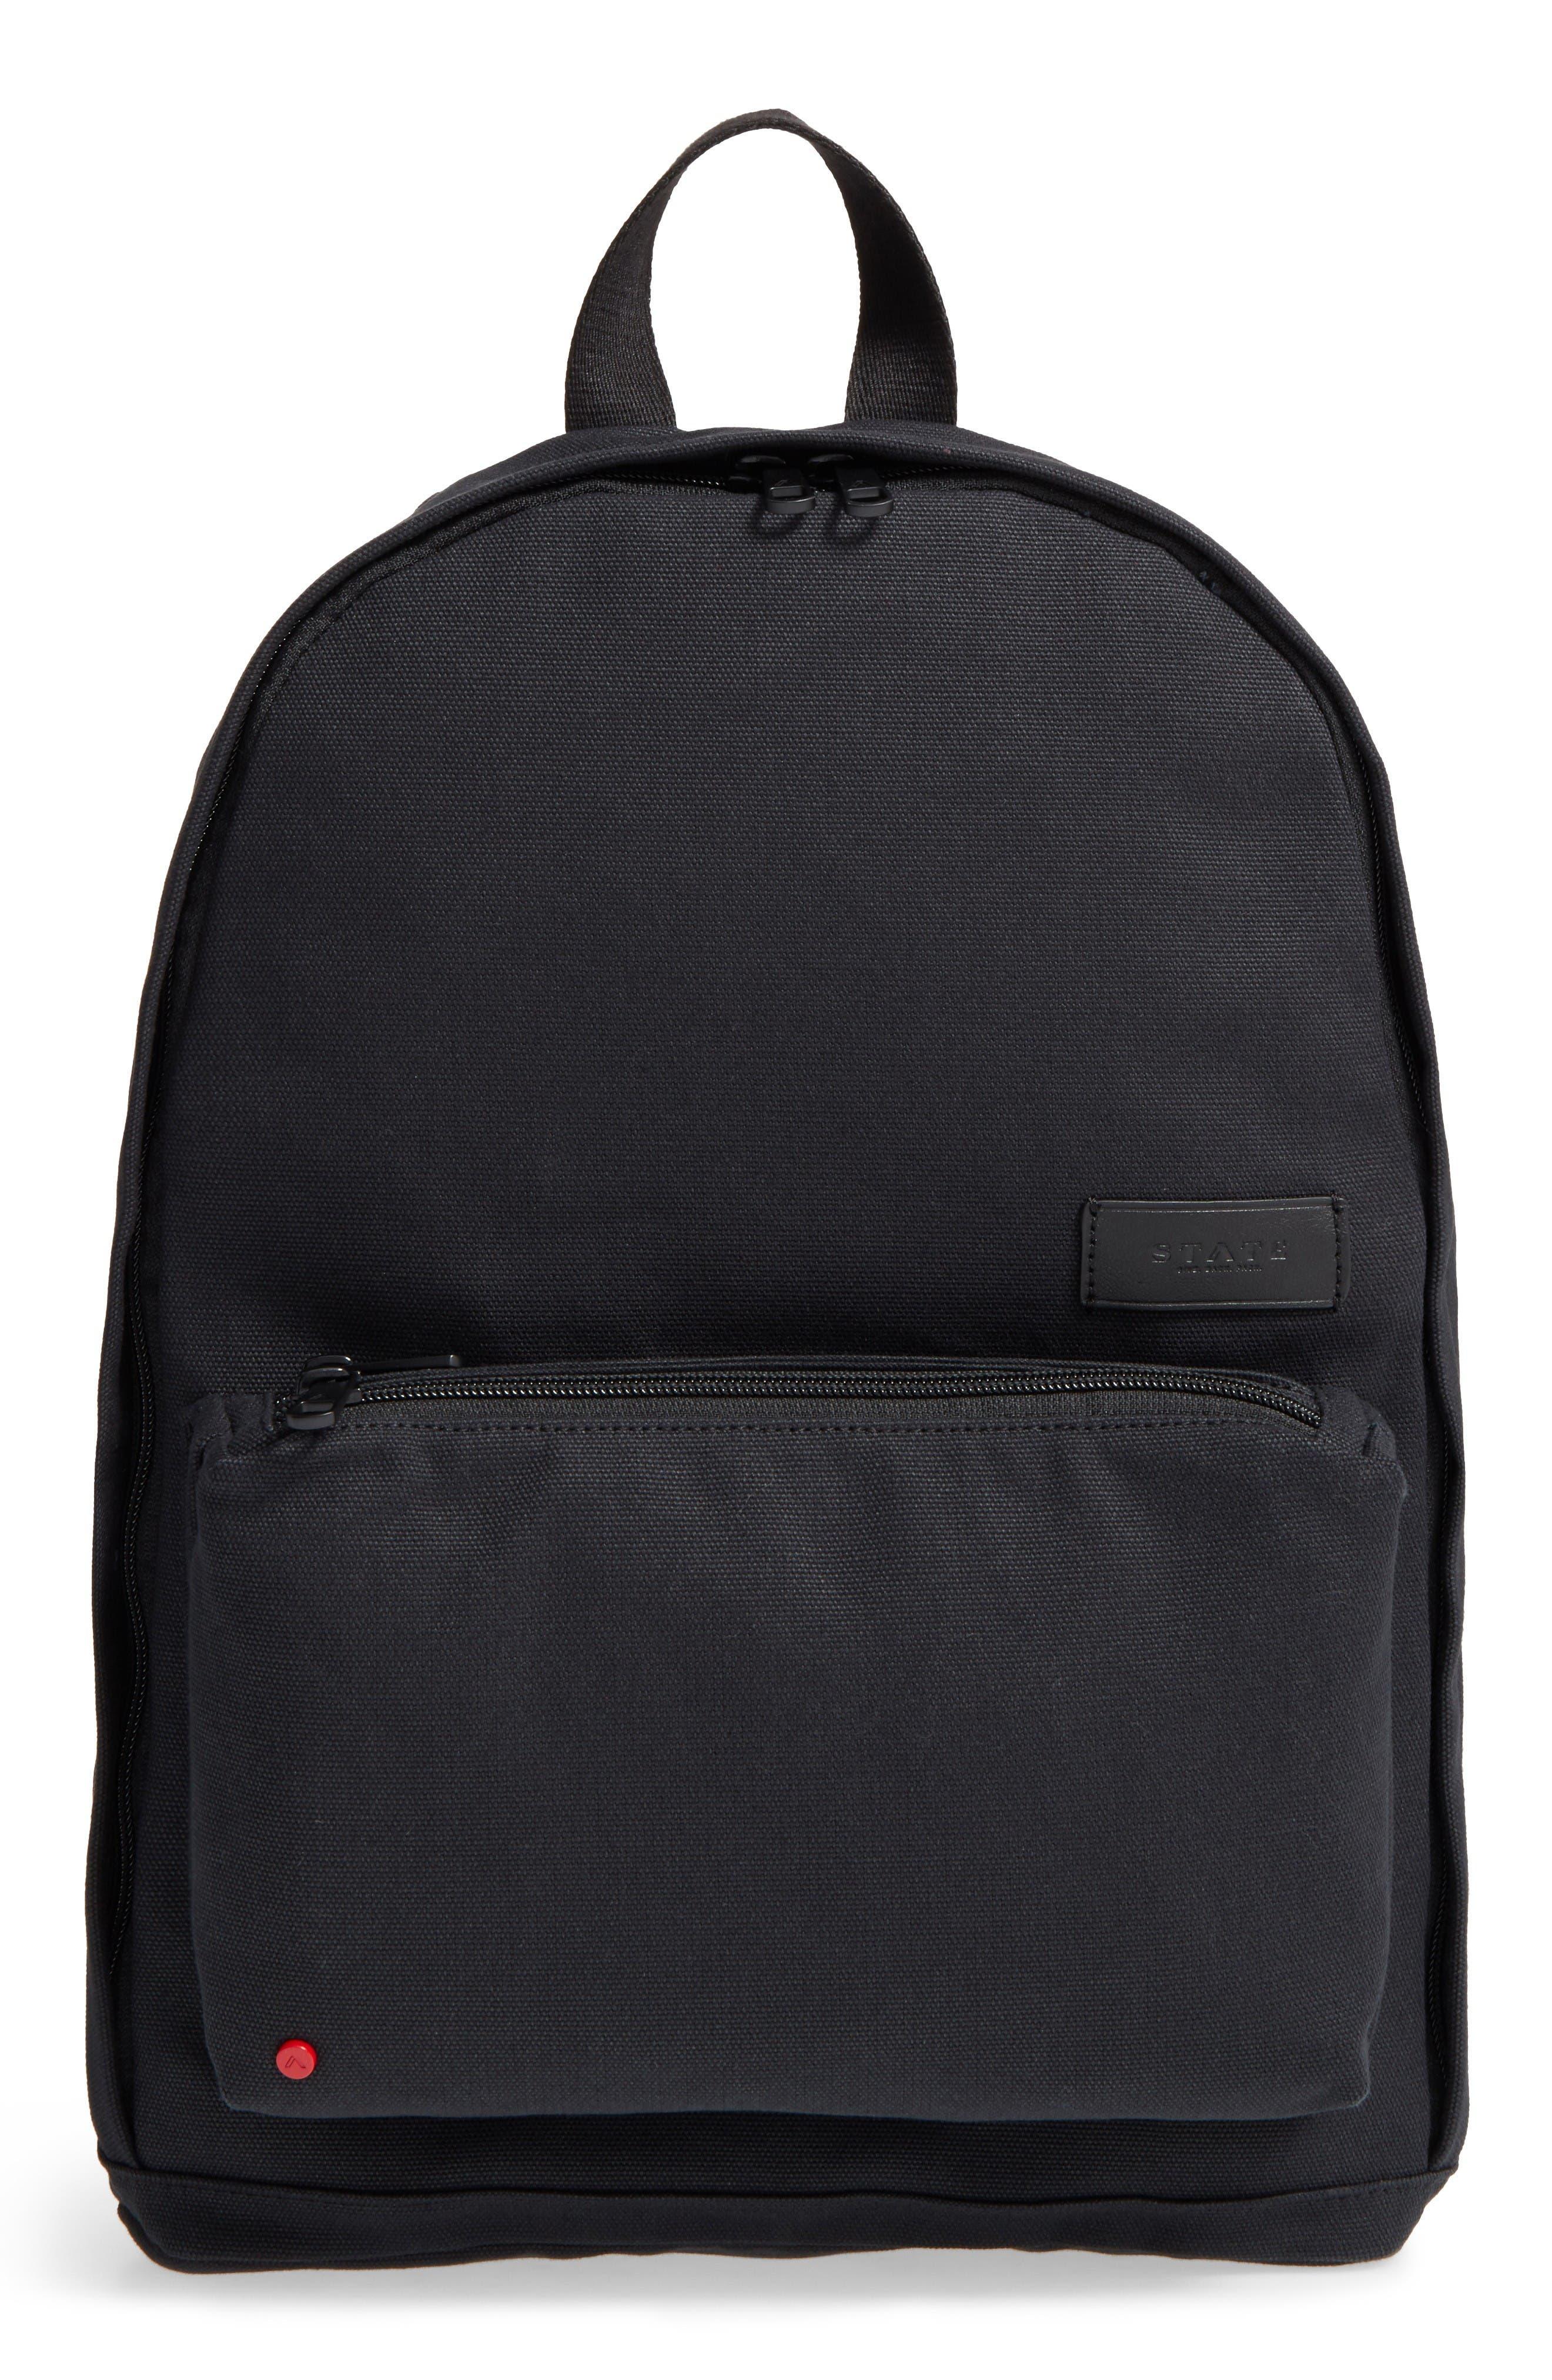 Main Image - STATE Bags Canvas Slim Lorimer Backpack